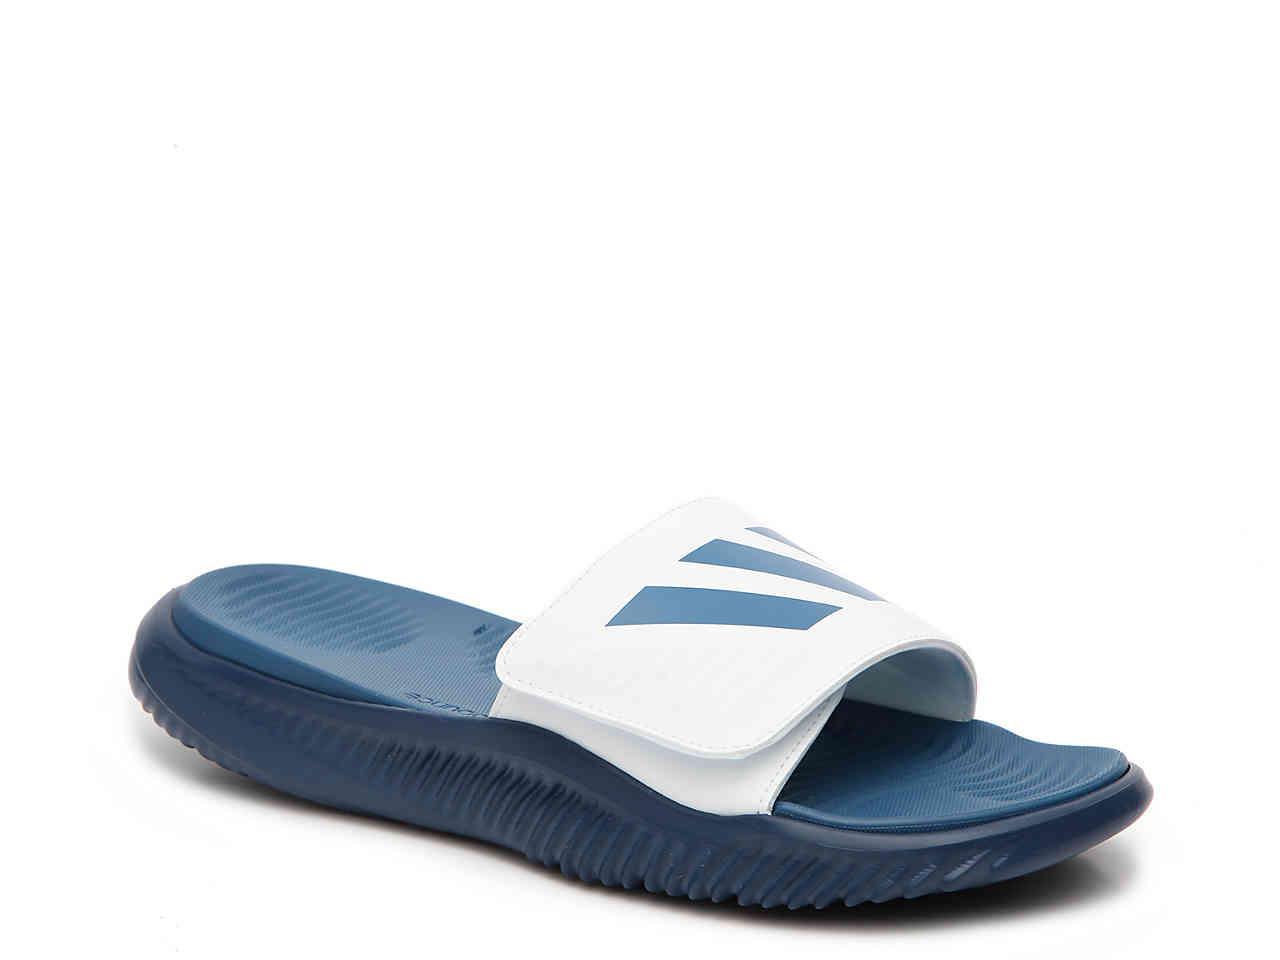 75d9c9c0be4 Lyst - adidas Alpha Bounce Slide Sandal in Blue for Men